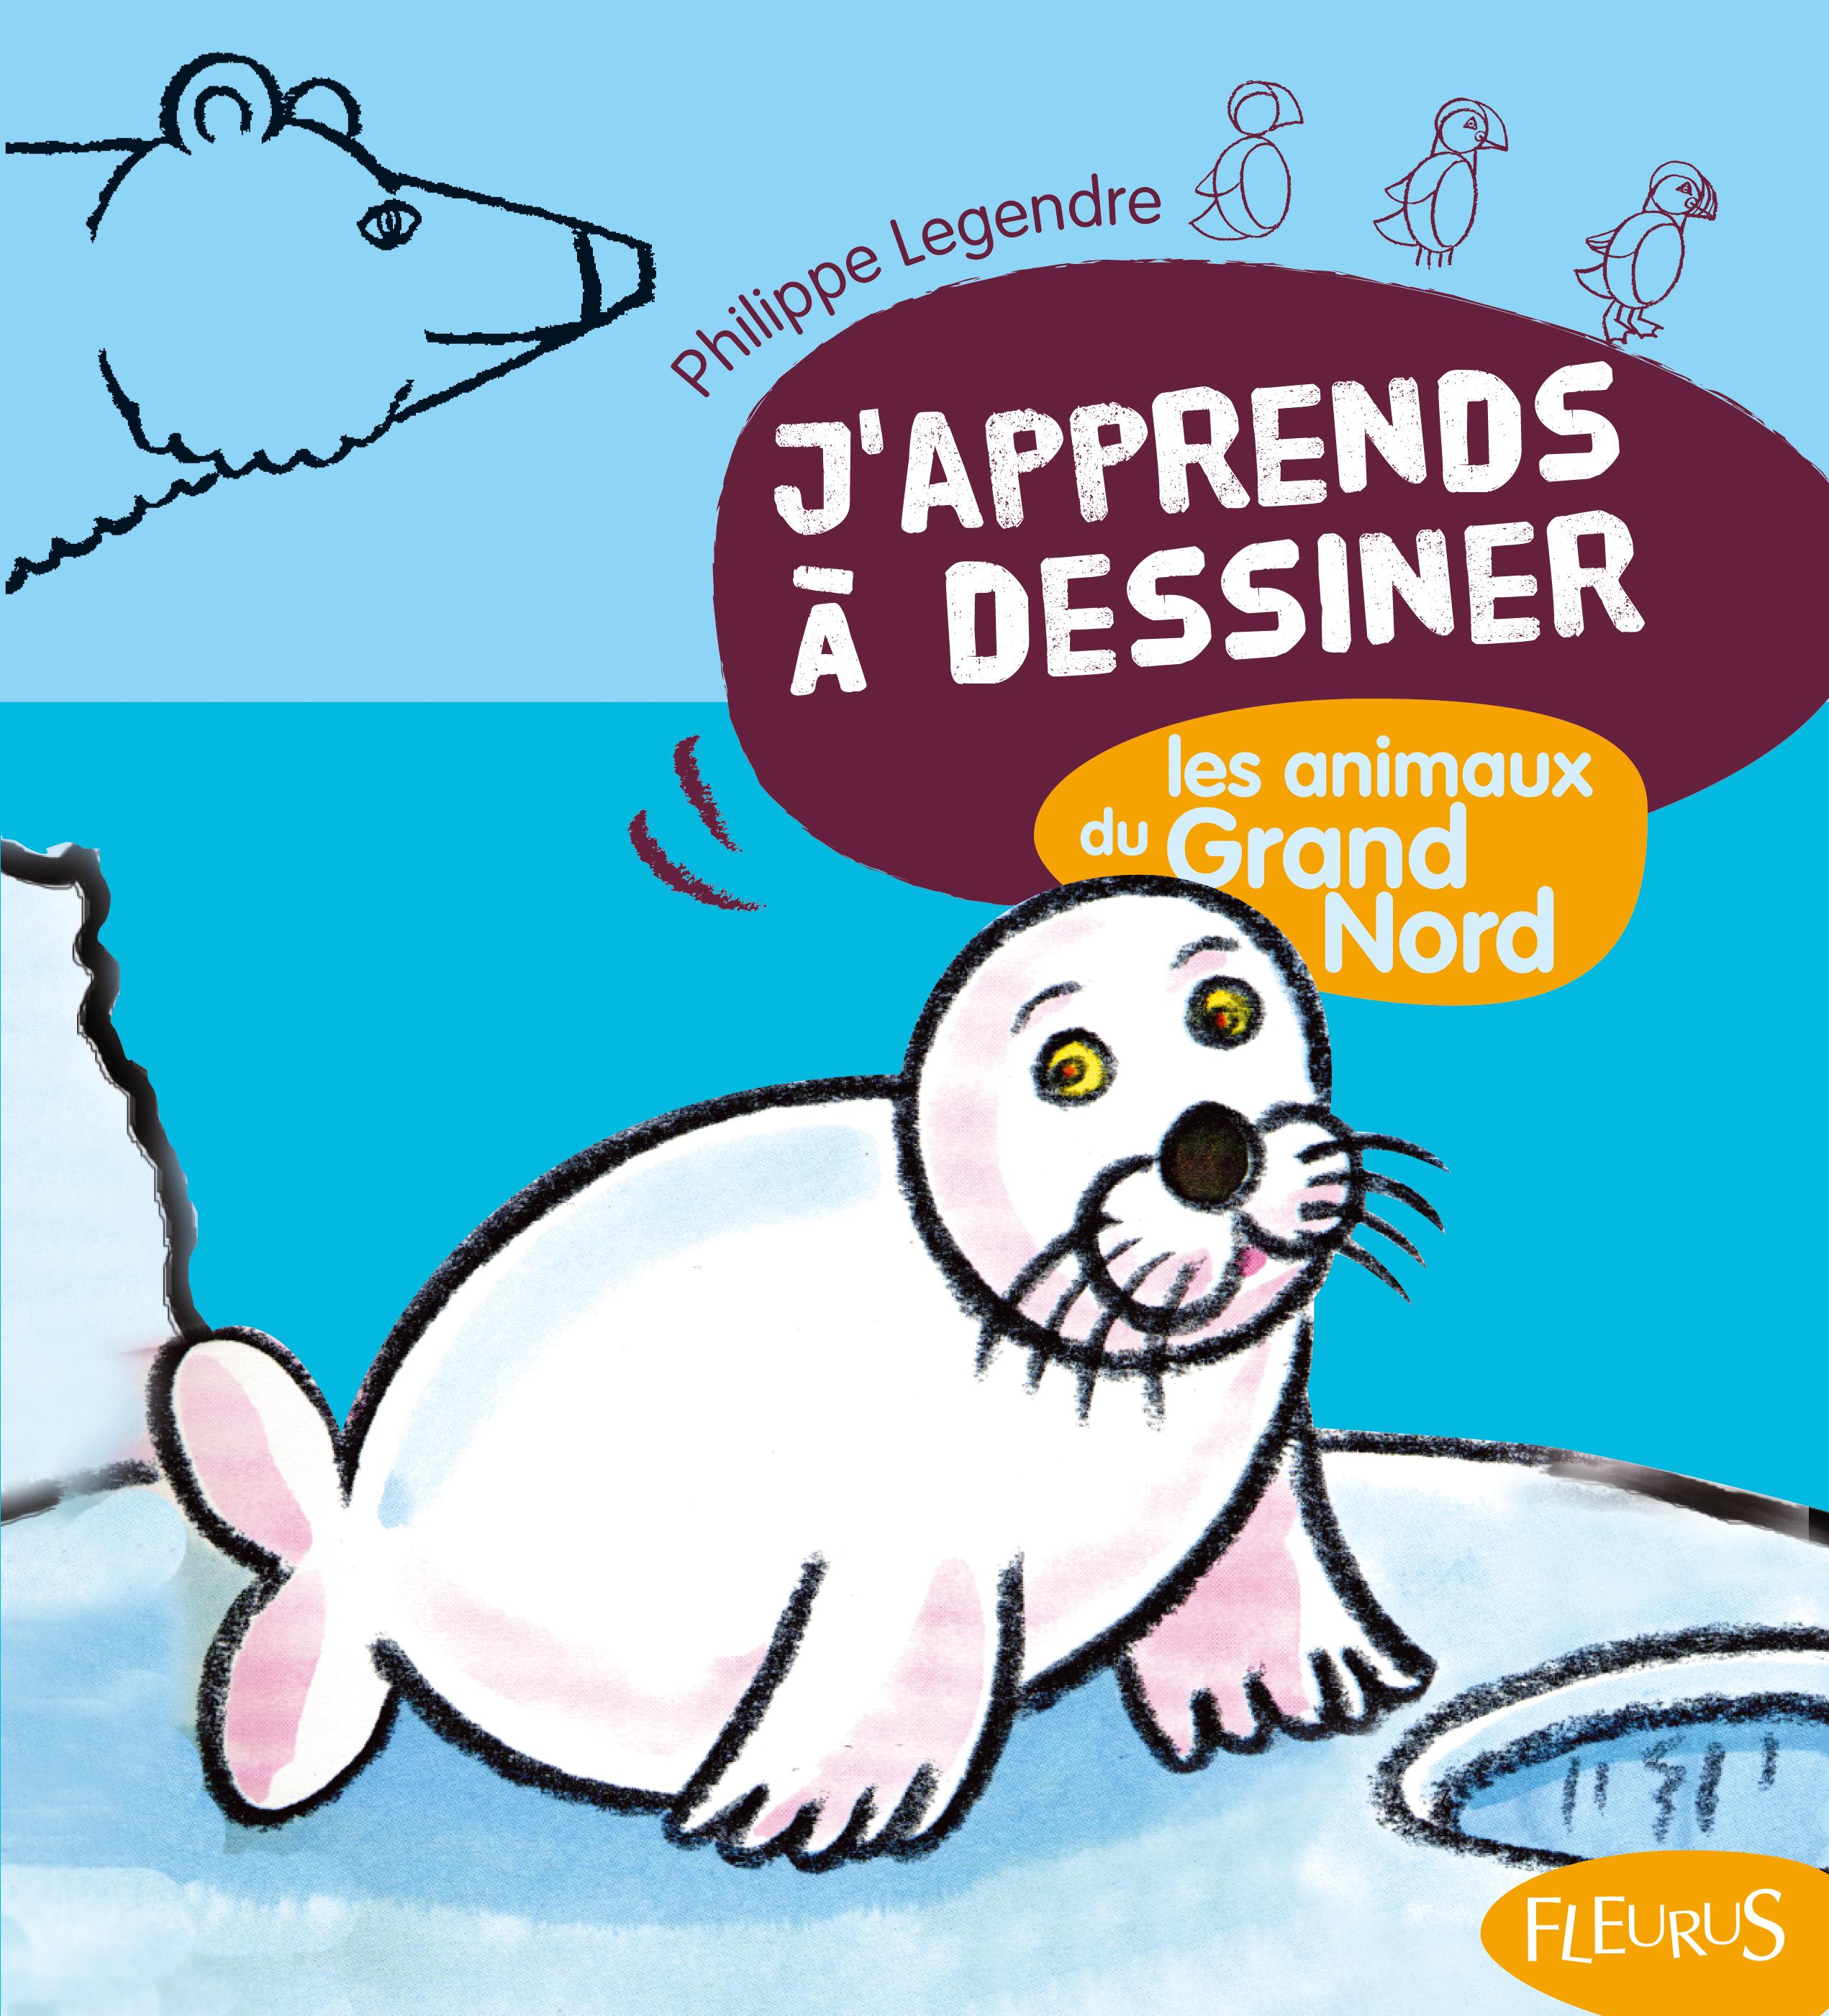 DESSINER LES ANIMAUX DU GRAND NORD